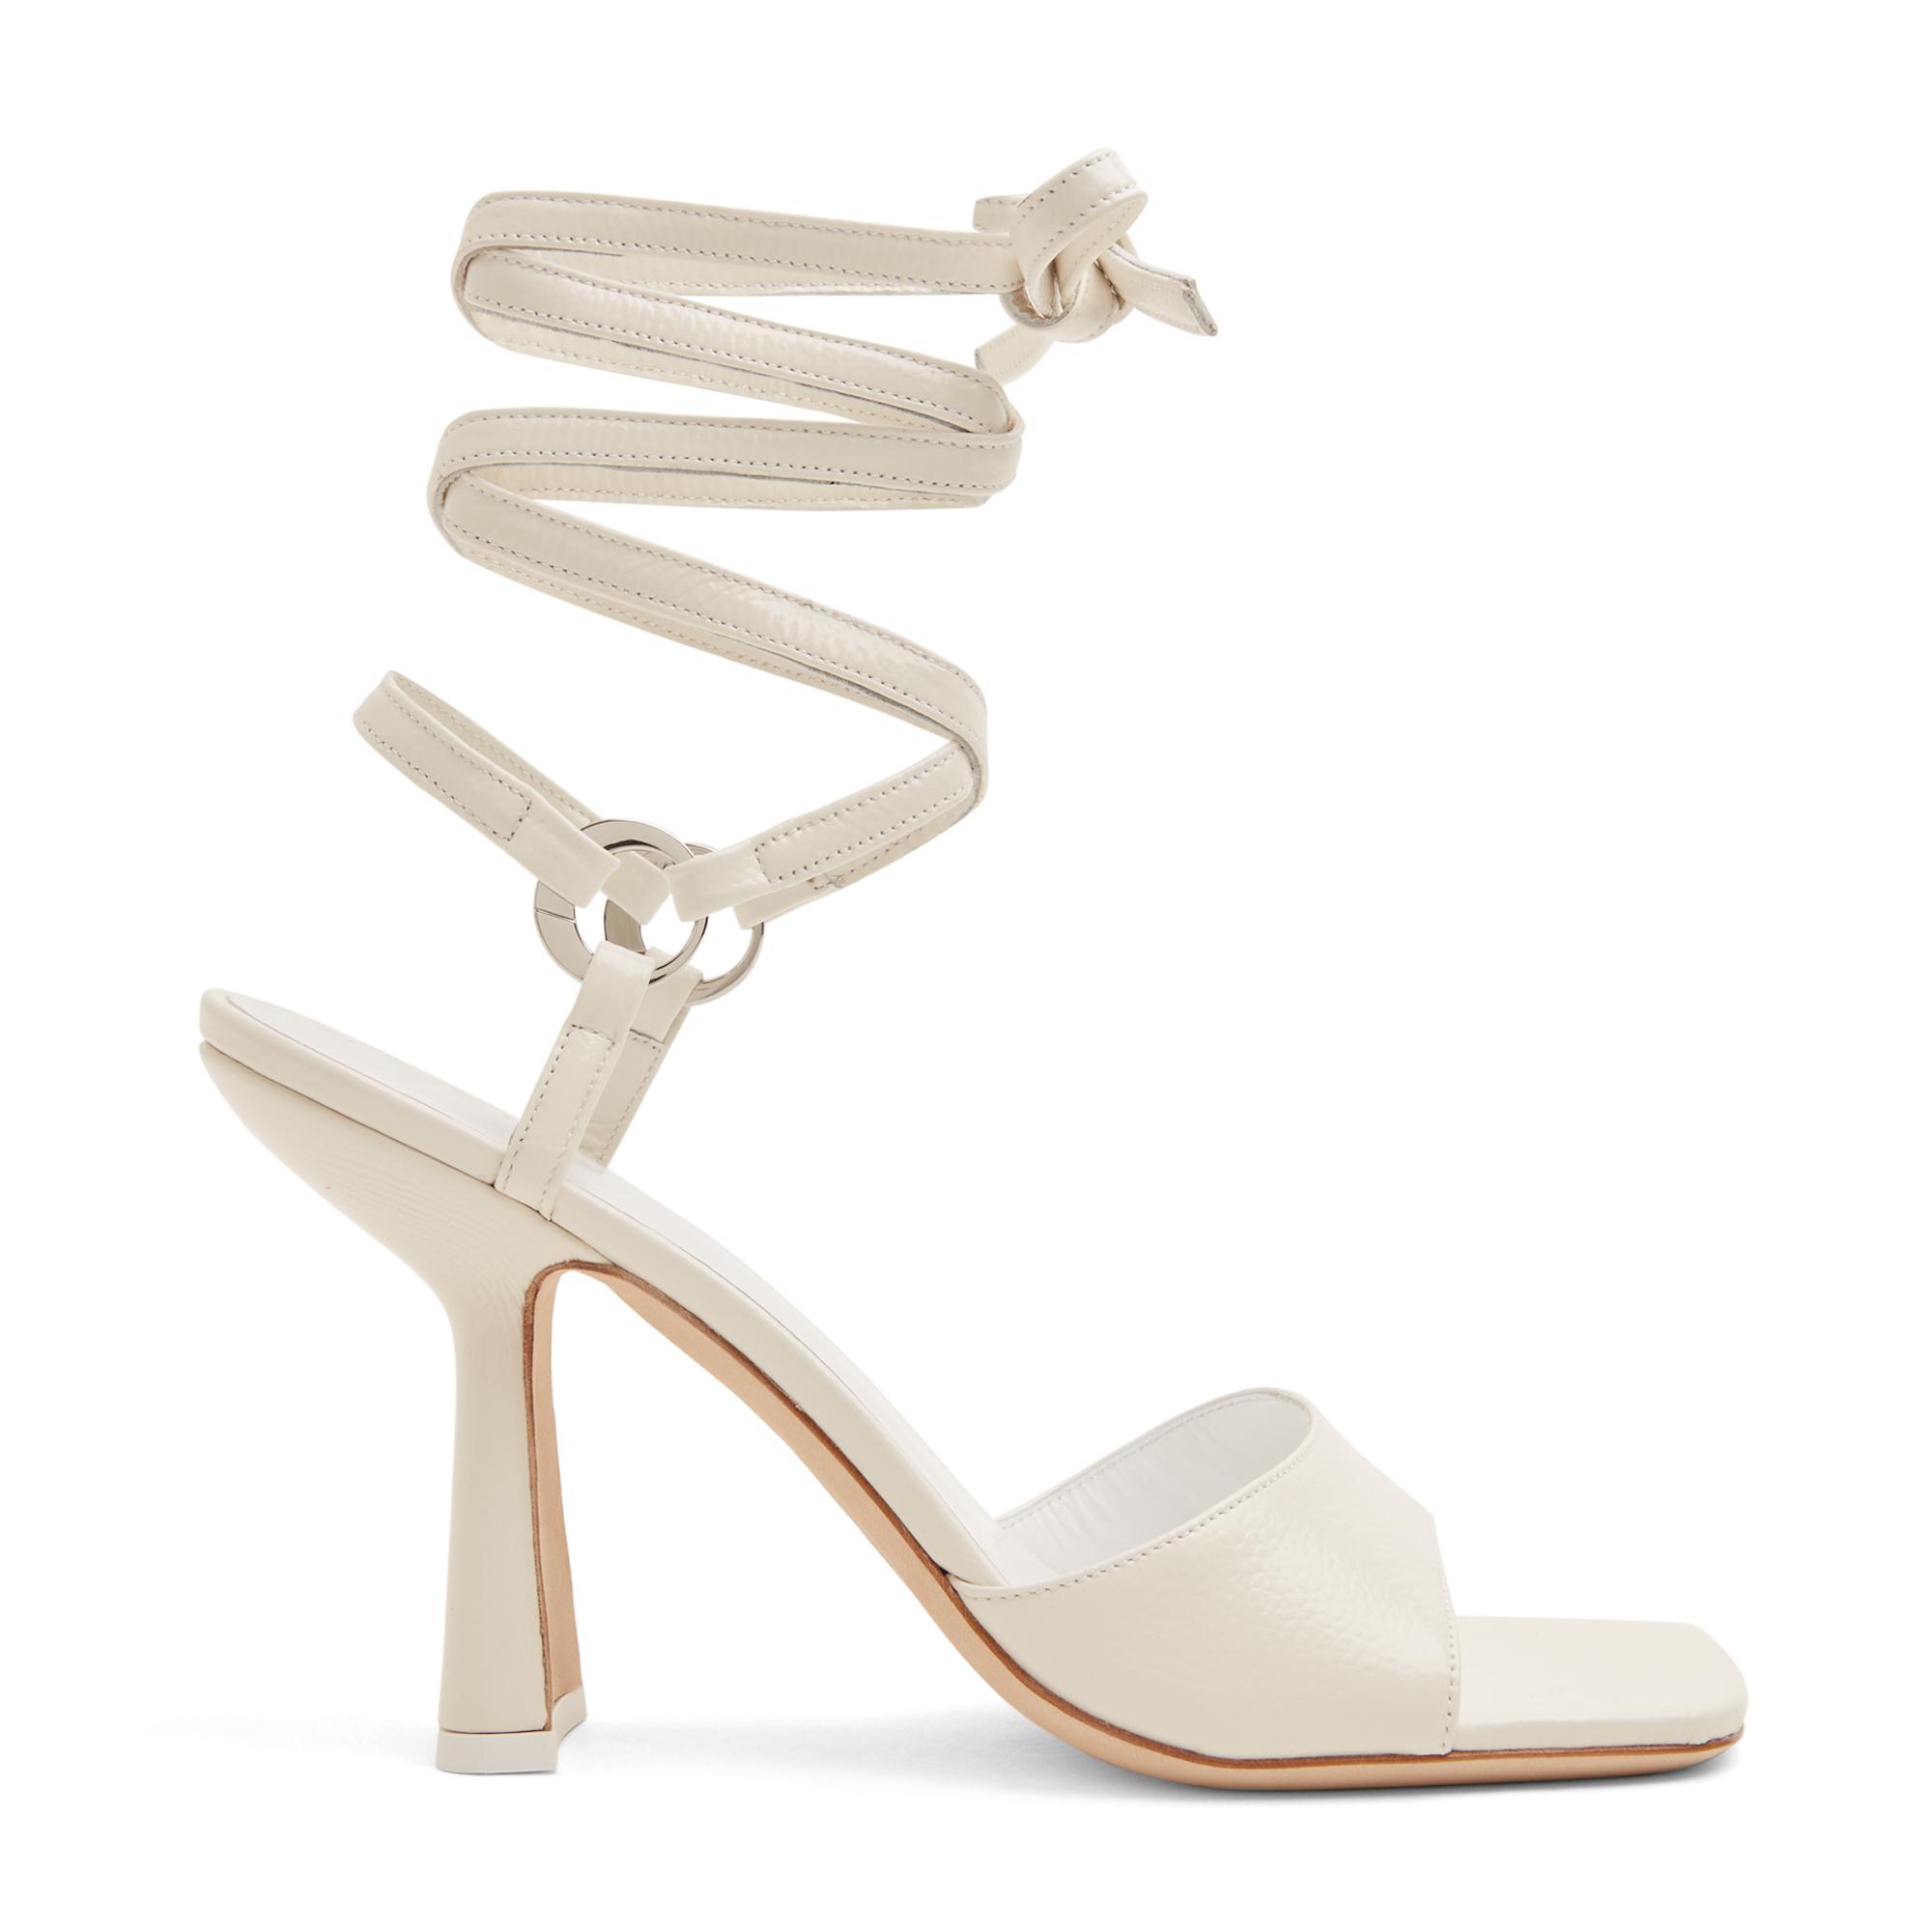 Fida sandals